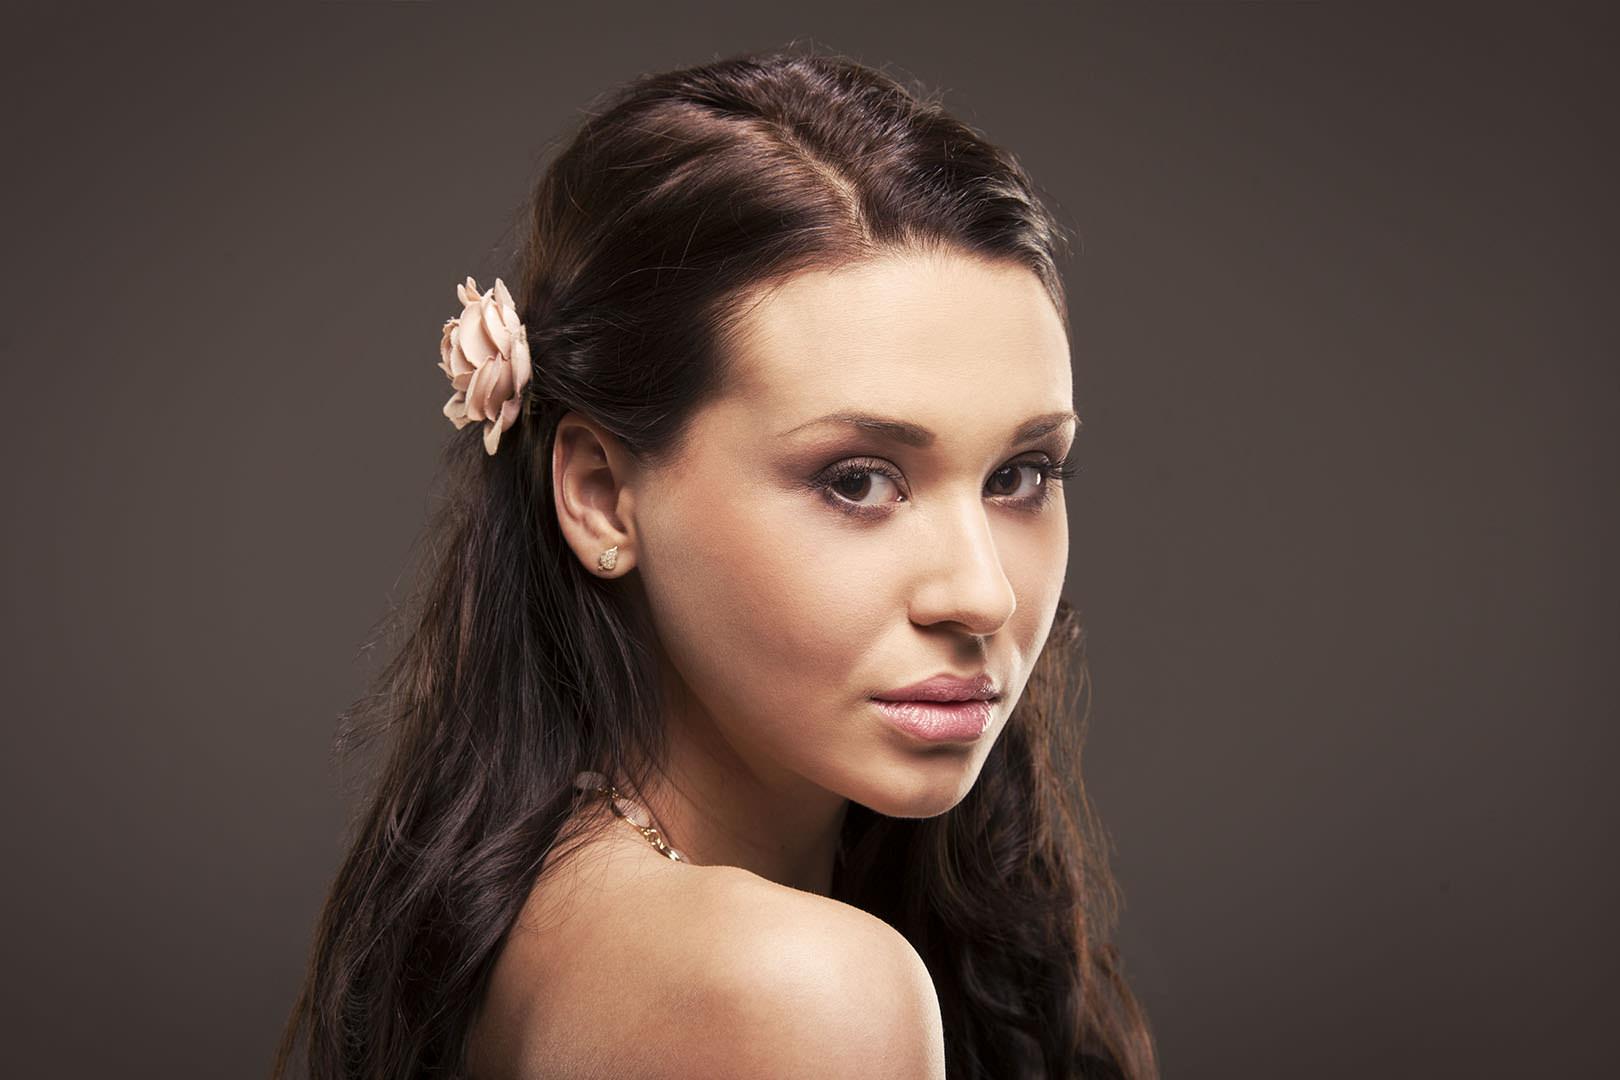 Magdalena_Dziadkowiak-Stefaniak_make_up_10